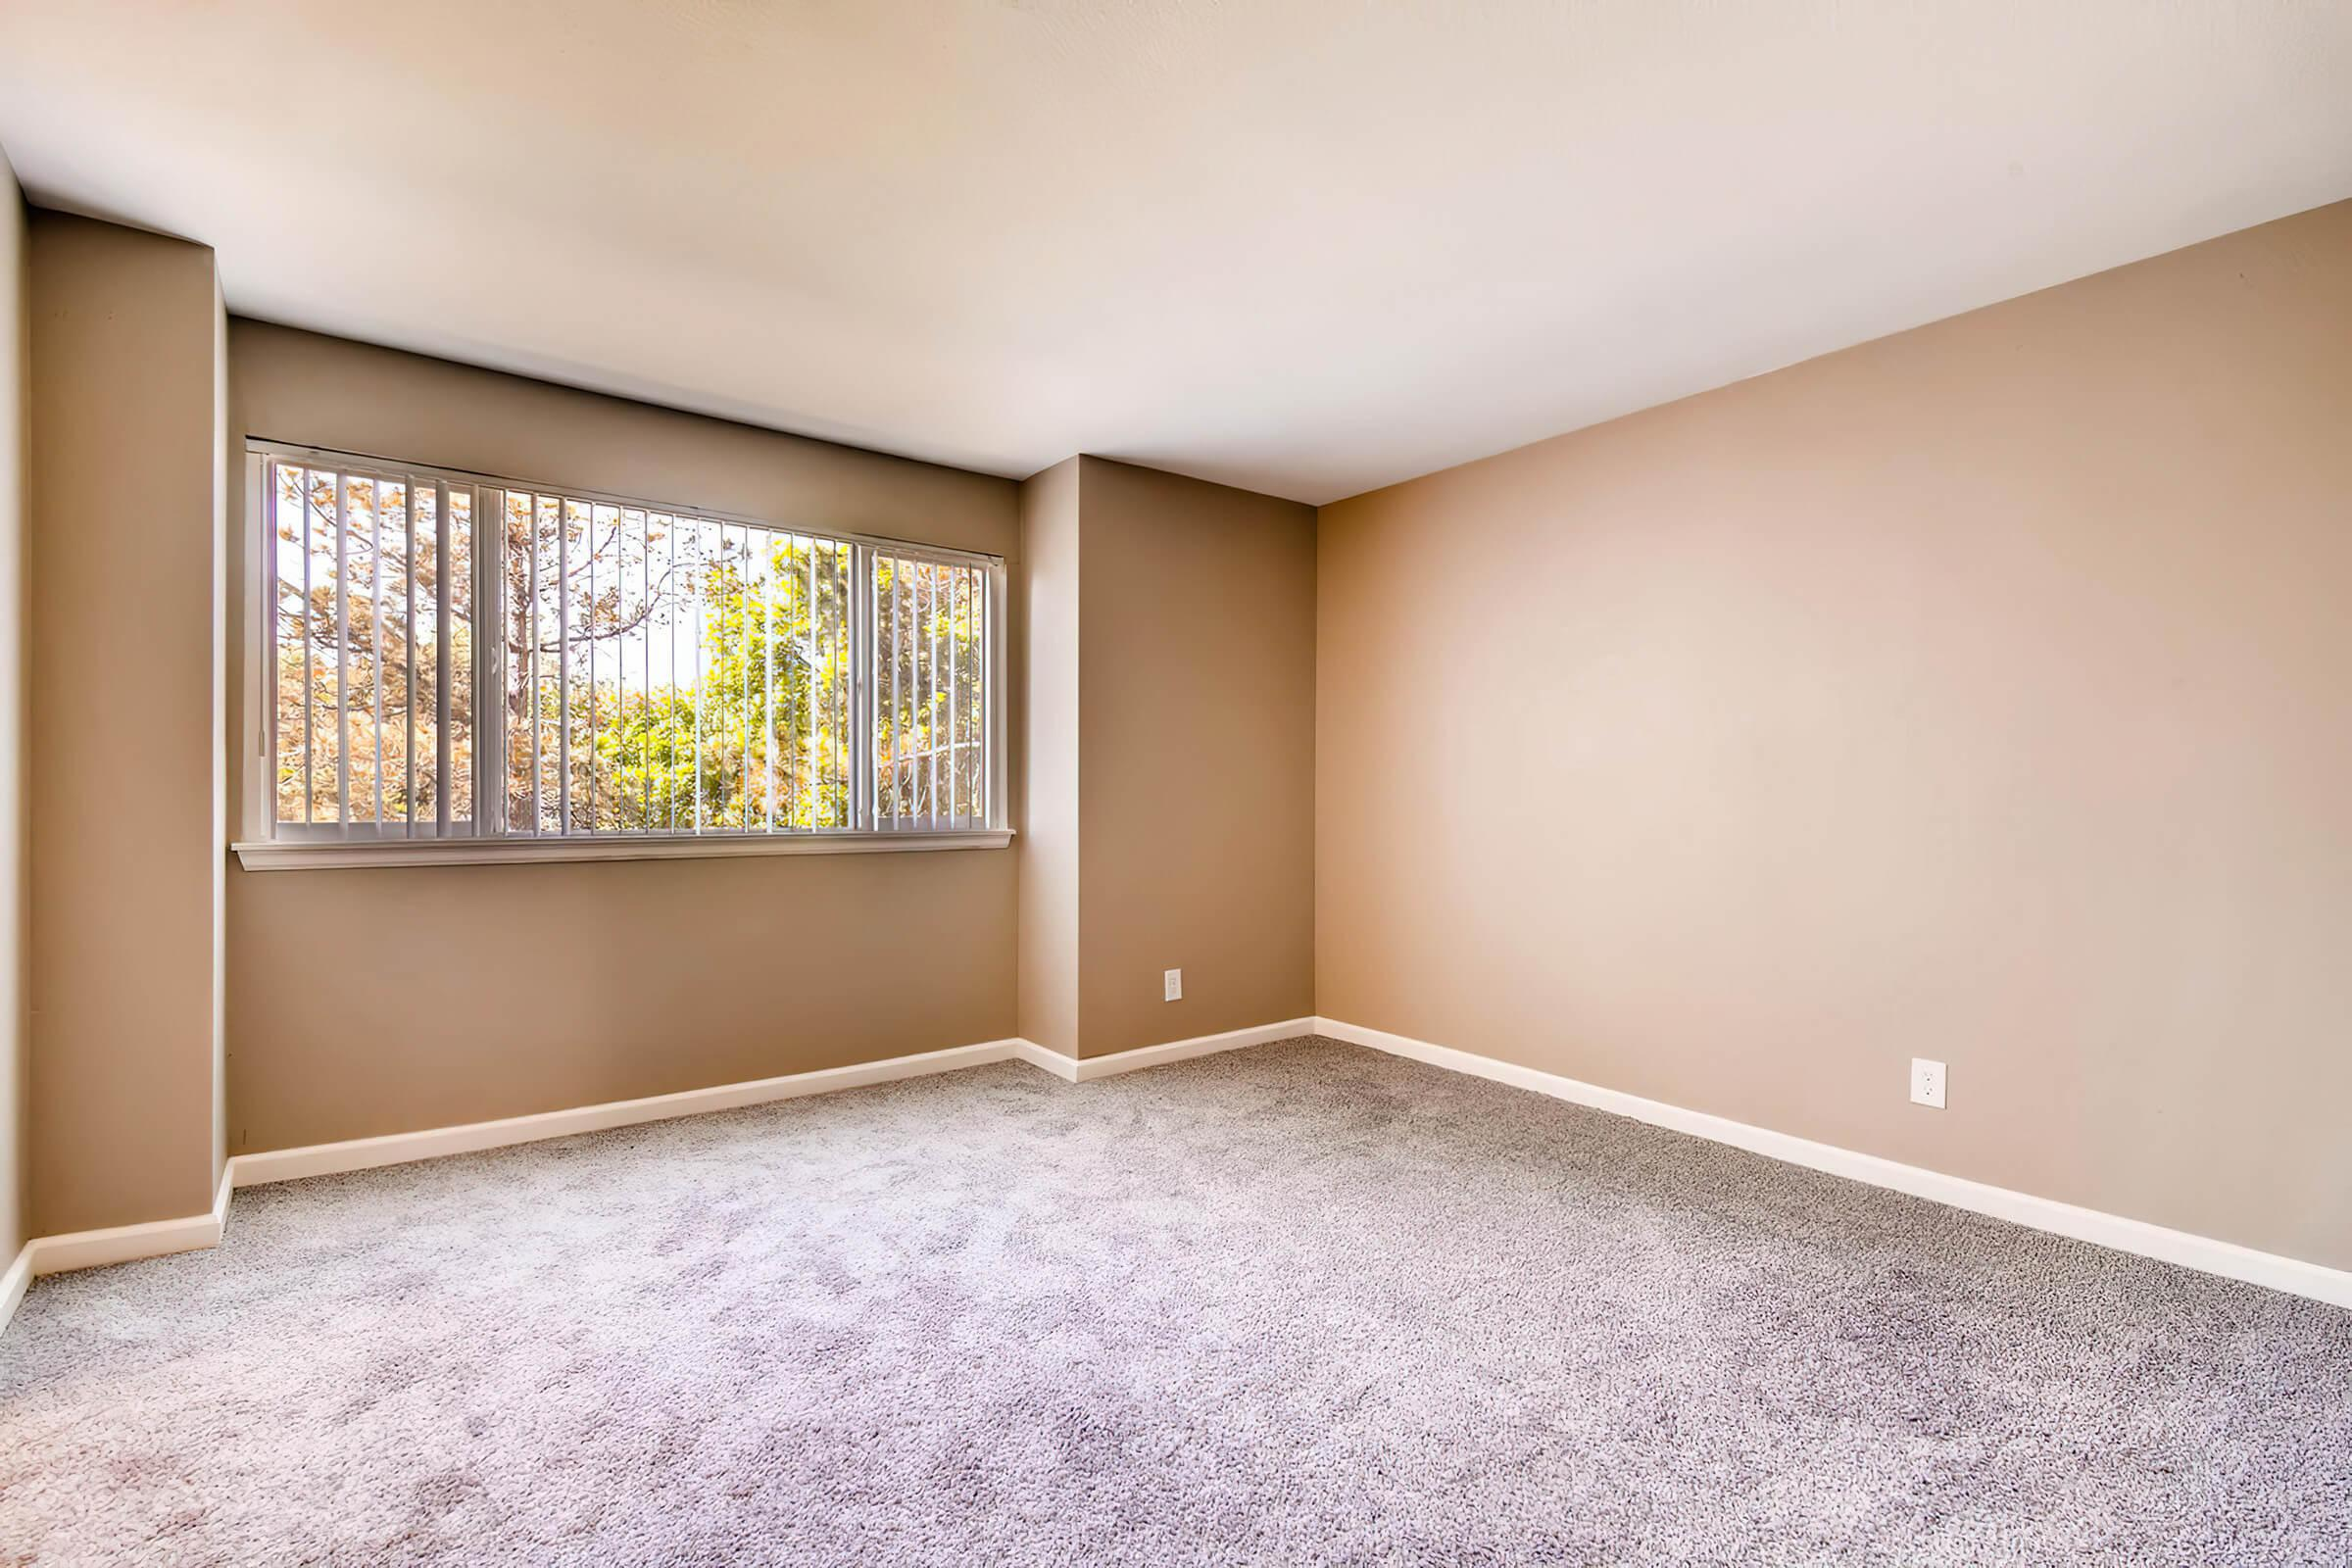 1801 E Girard Pl Unit 157-large-013-16-2nd Floor Master Bedroom-1500x1000-72dpi.jpg